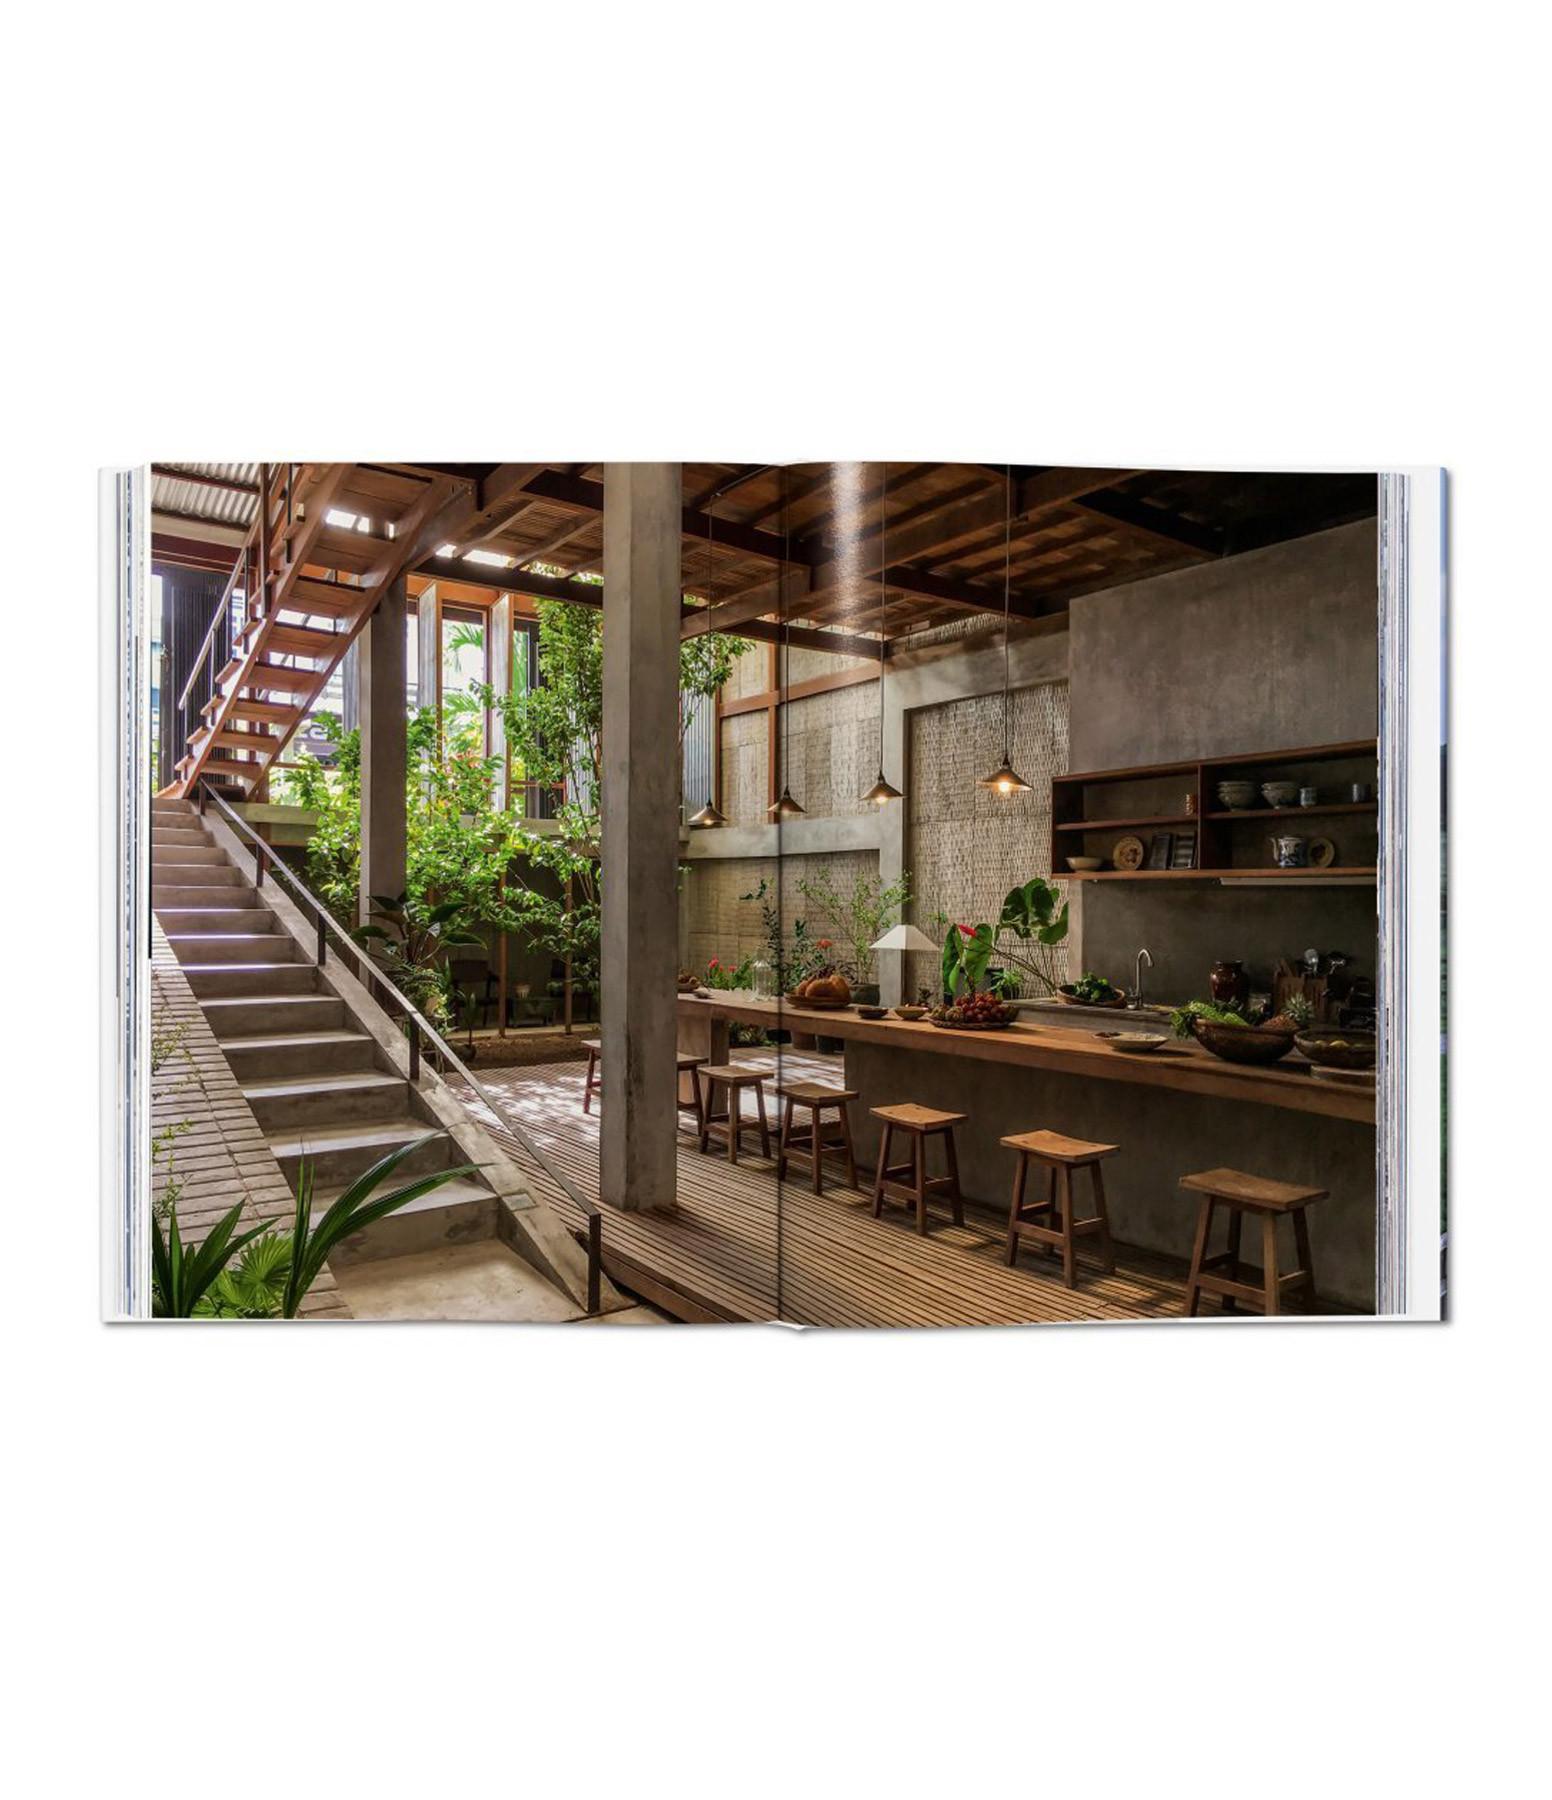 TASCHEN - Livre Contemporary Houses, 100 Homes Around The World